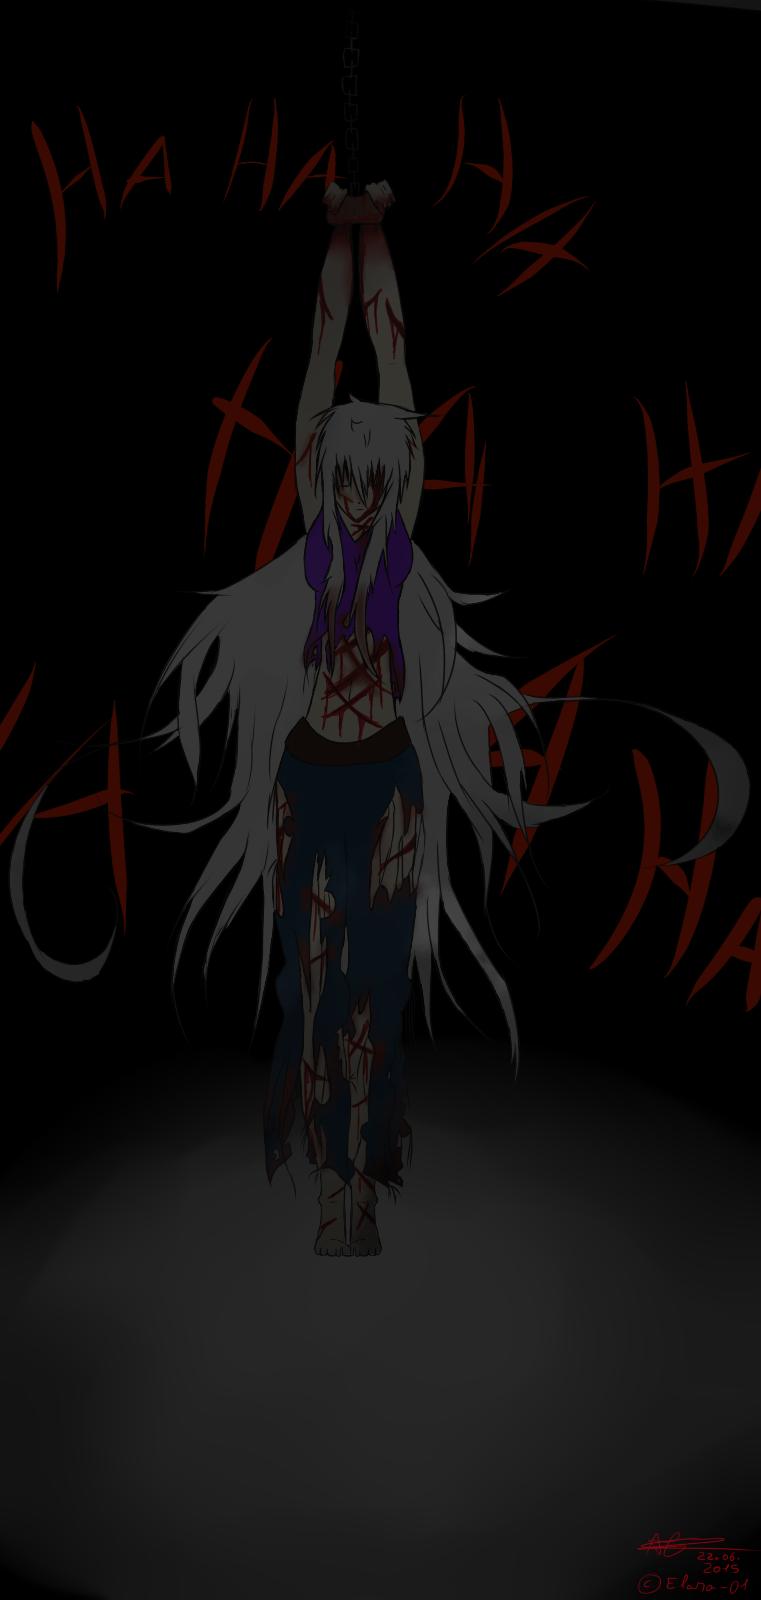 Elana - Bad situation by Elana-01